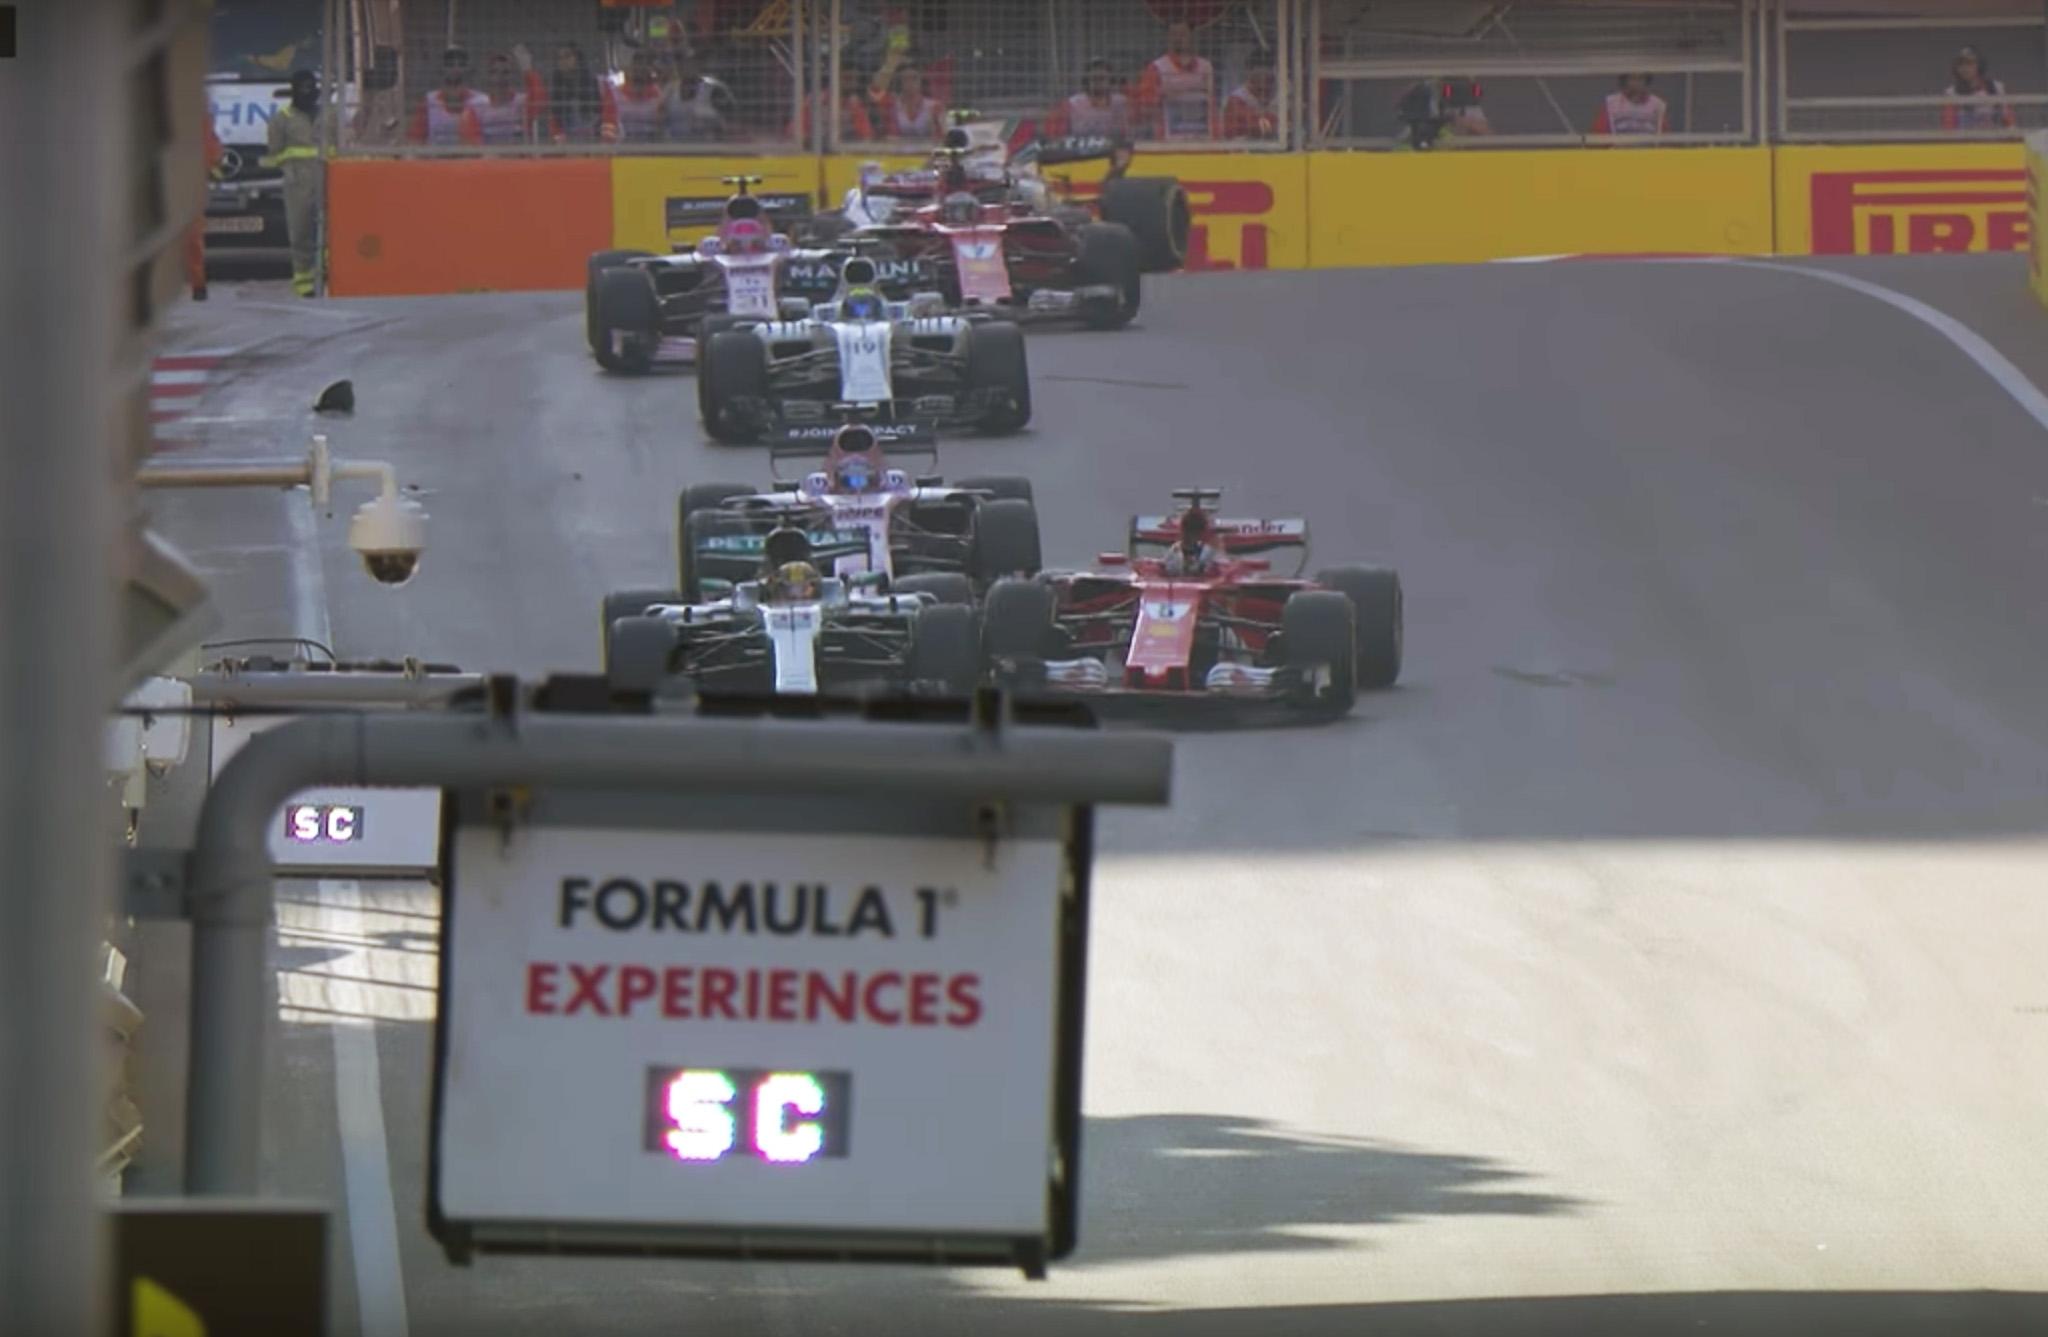 Sebastian Vettel vs Lewis Hamliton at Baku - Wreck under caution